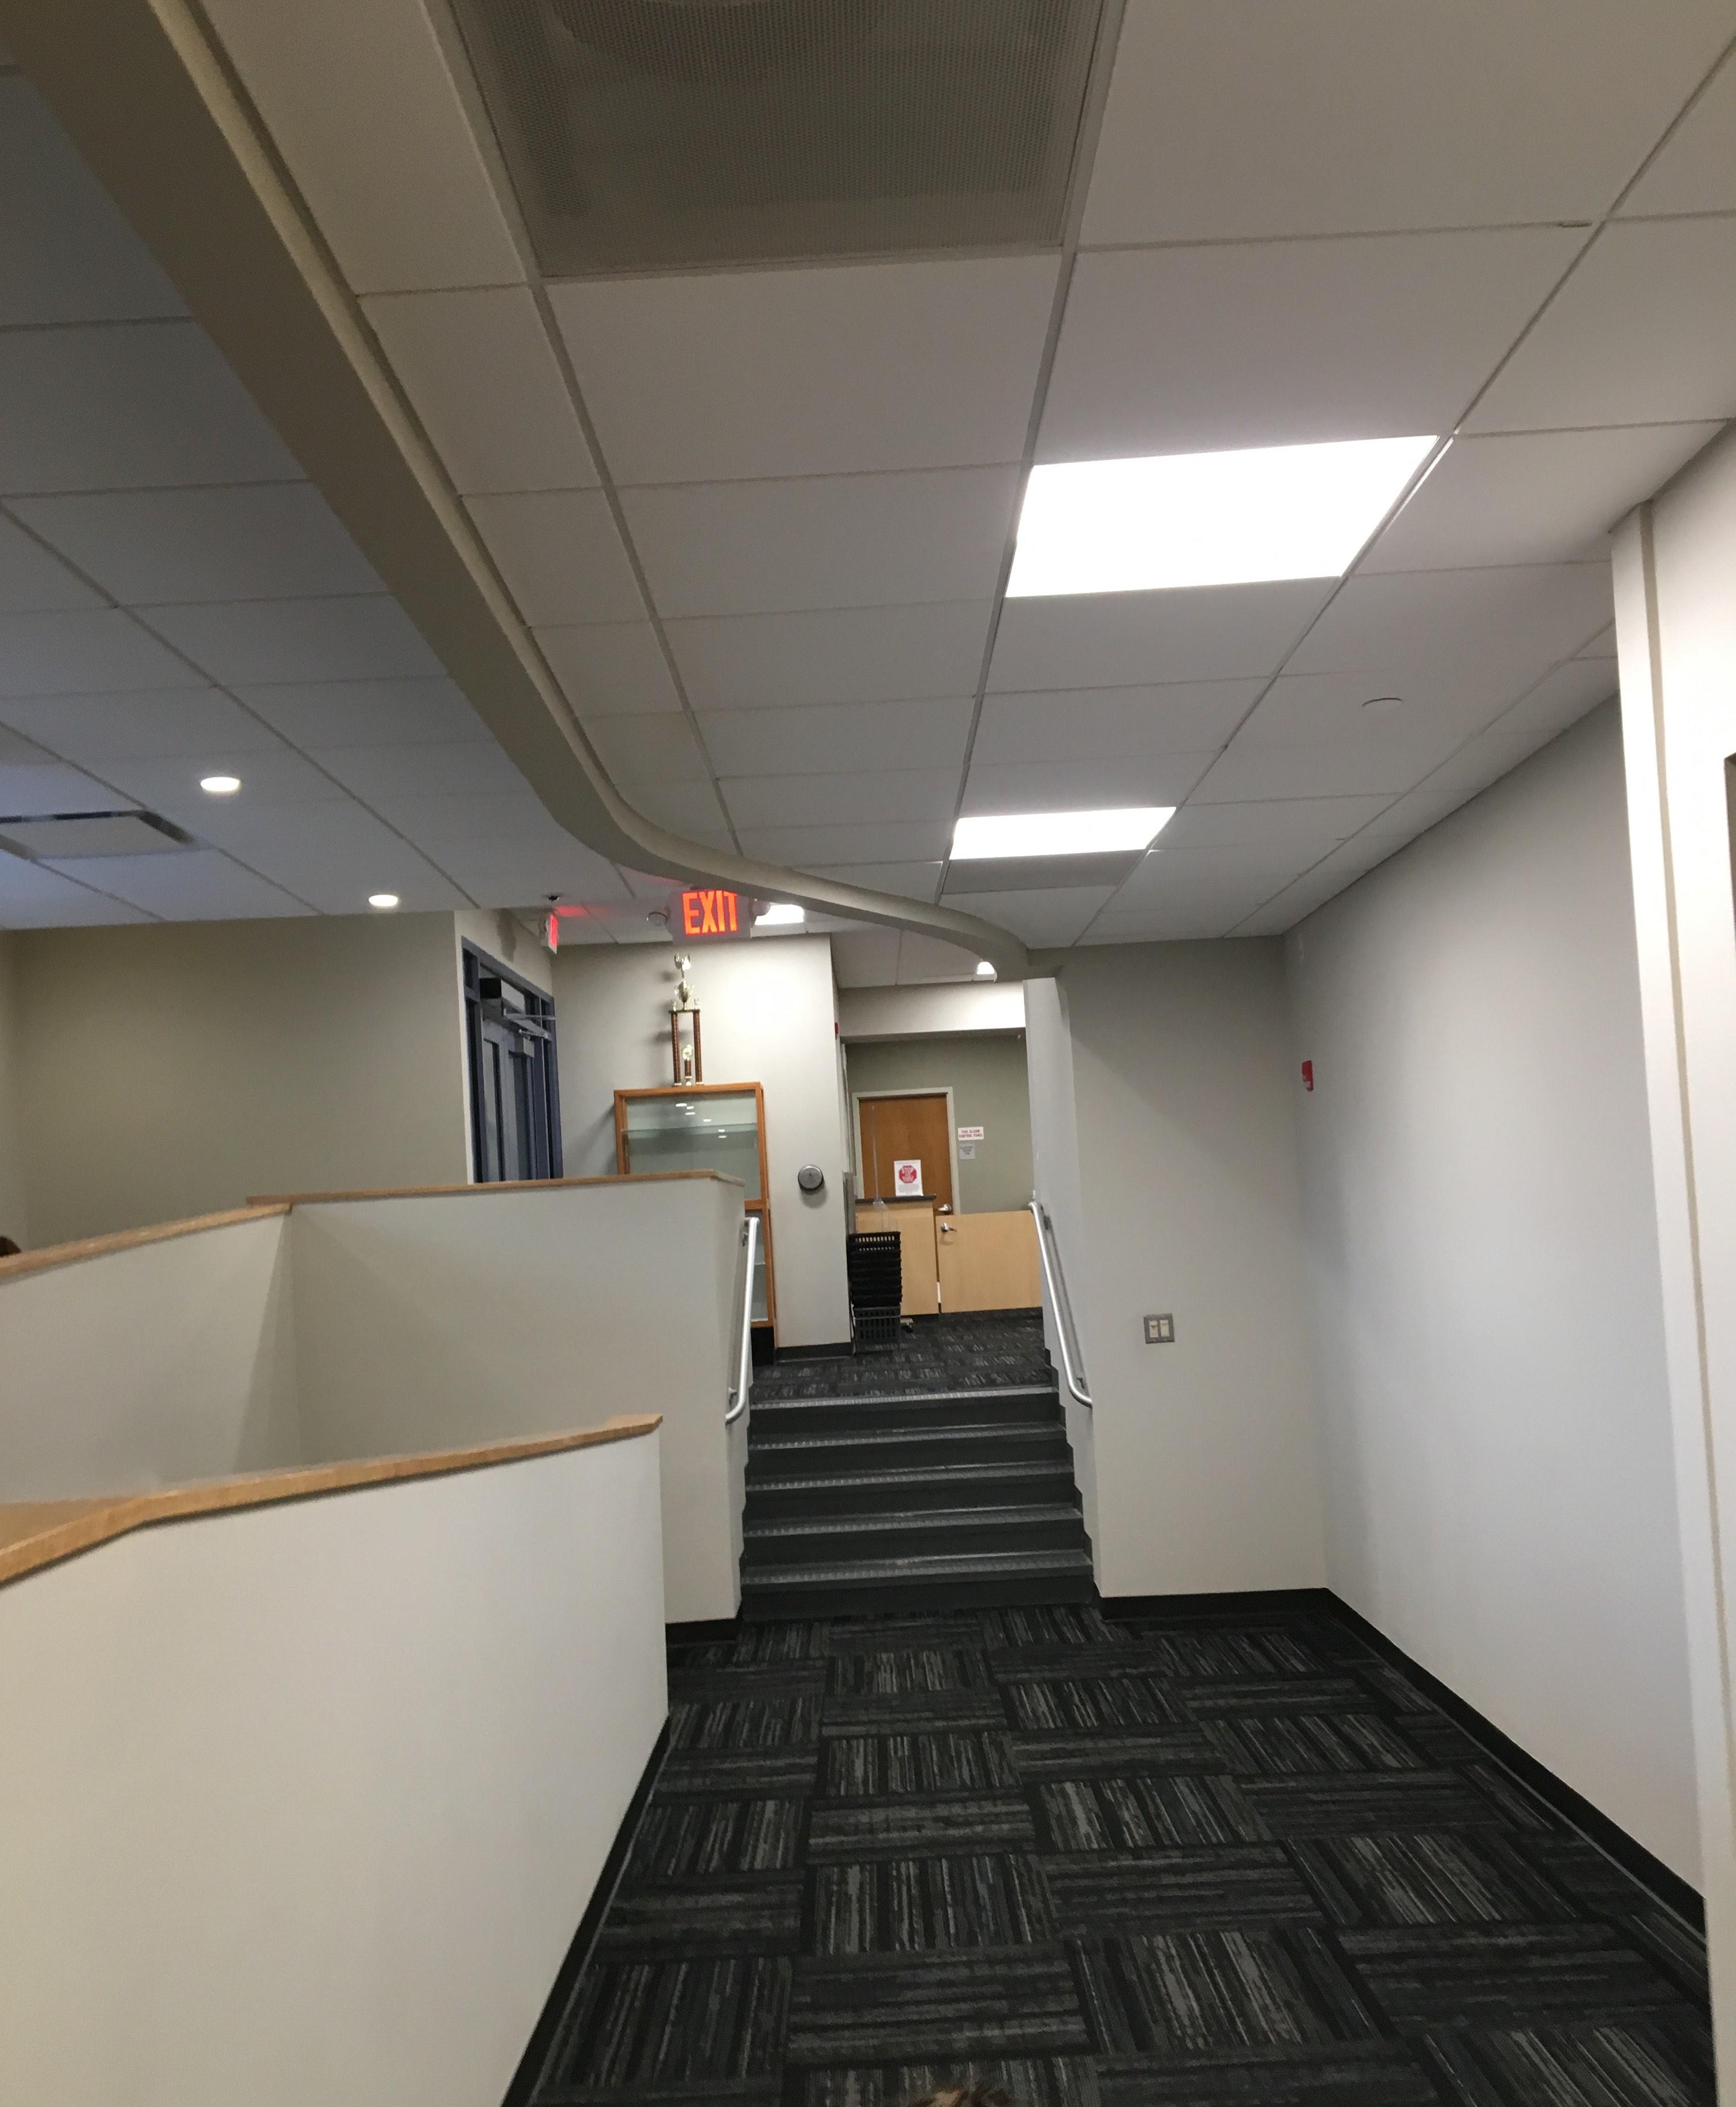 8ee8a4945865f9ced9a7_library_hallway.jpg